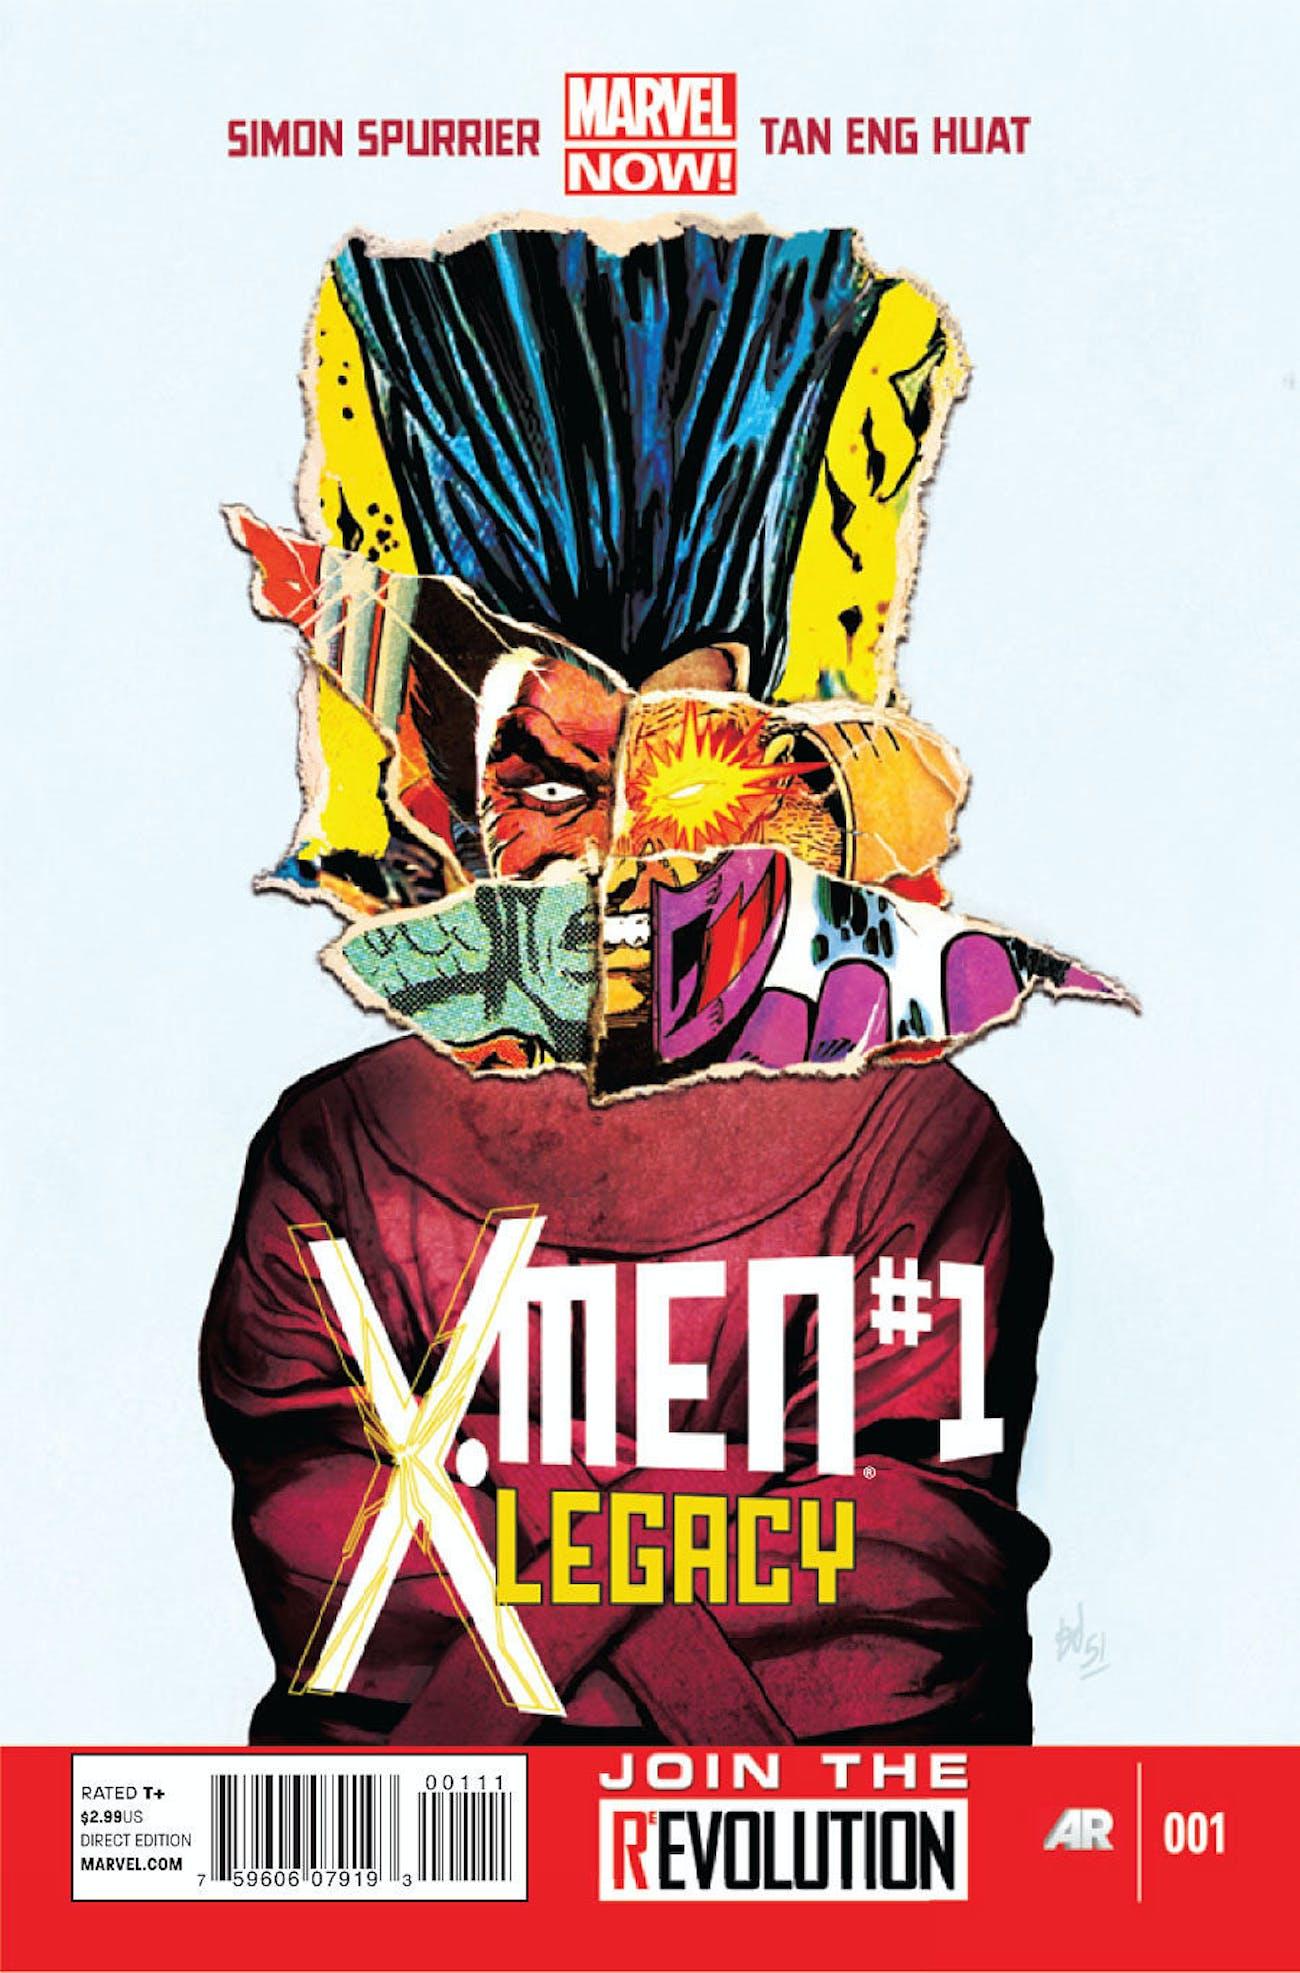 Legion Covers Marvel